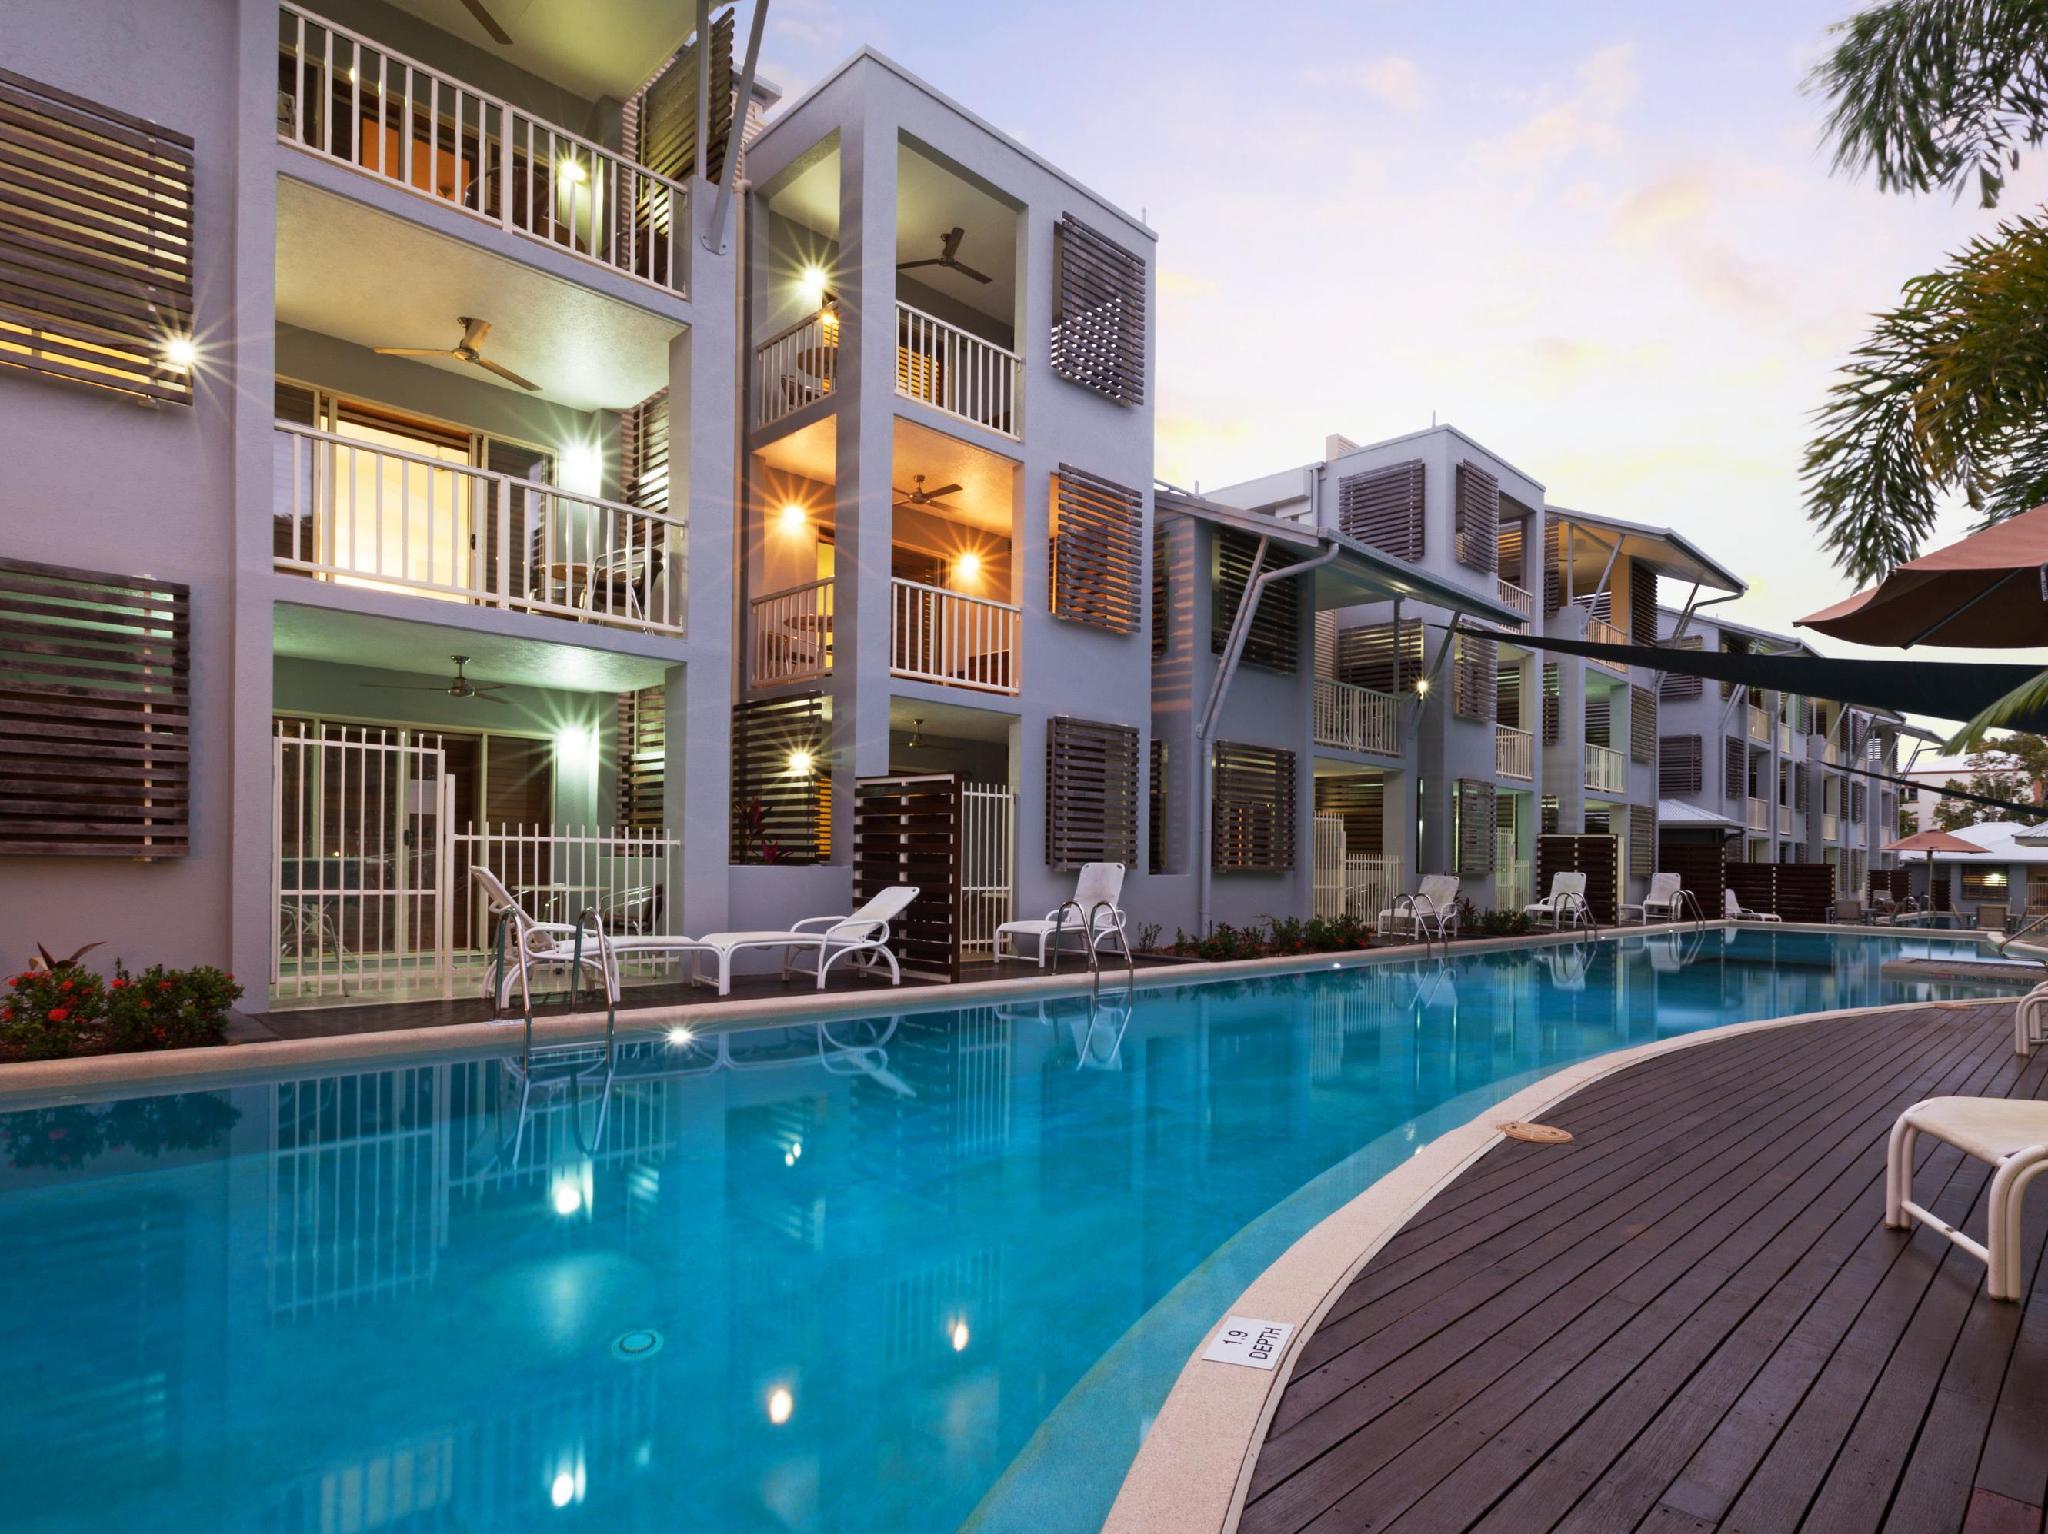 Mantra Aqueous on Port Resort - Hotell och Boende i Australien , Port Douglas